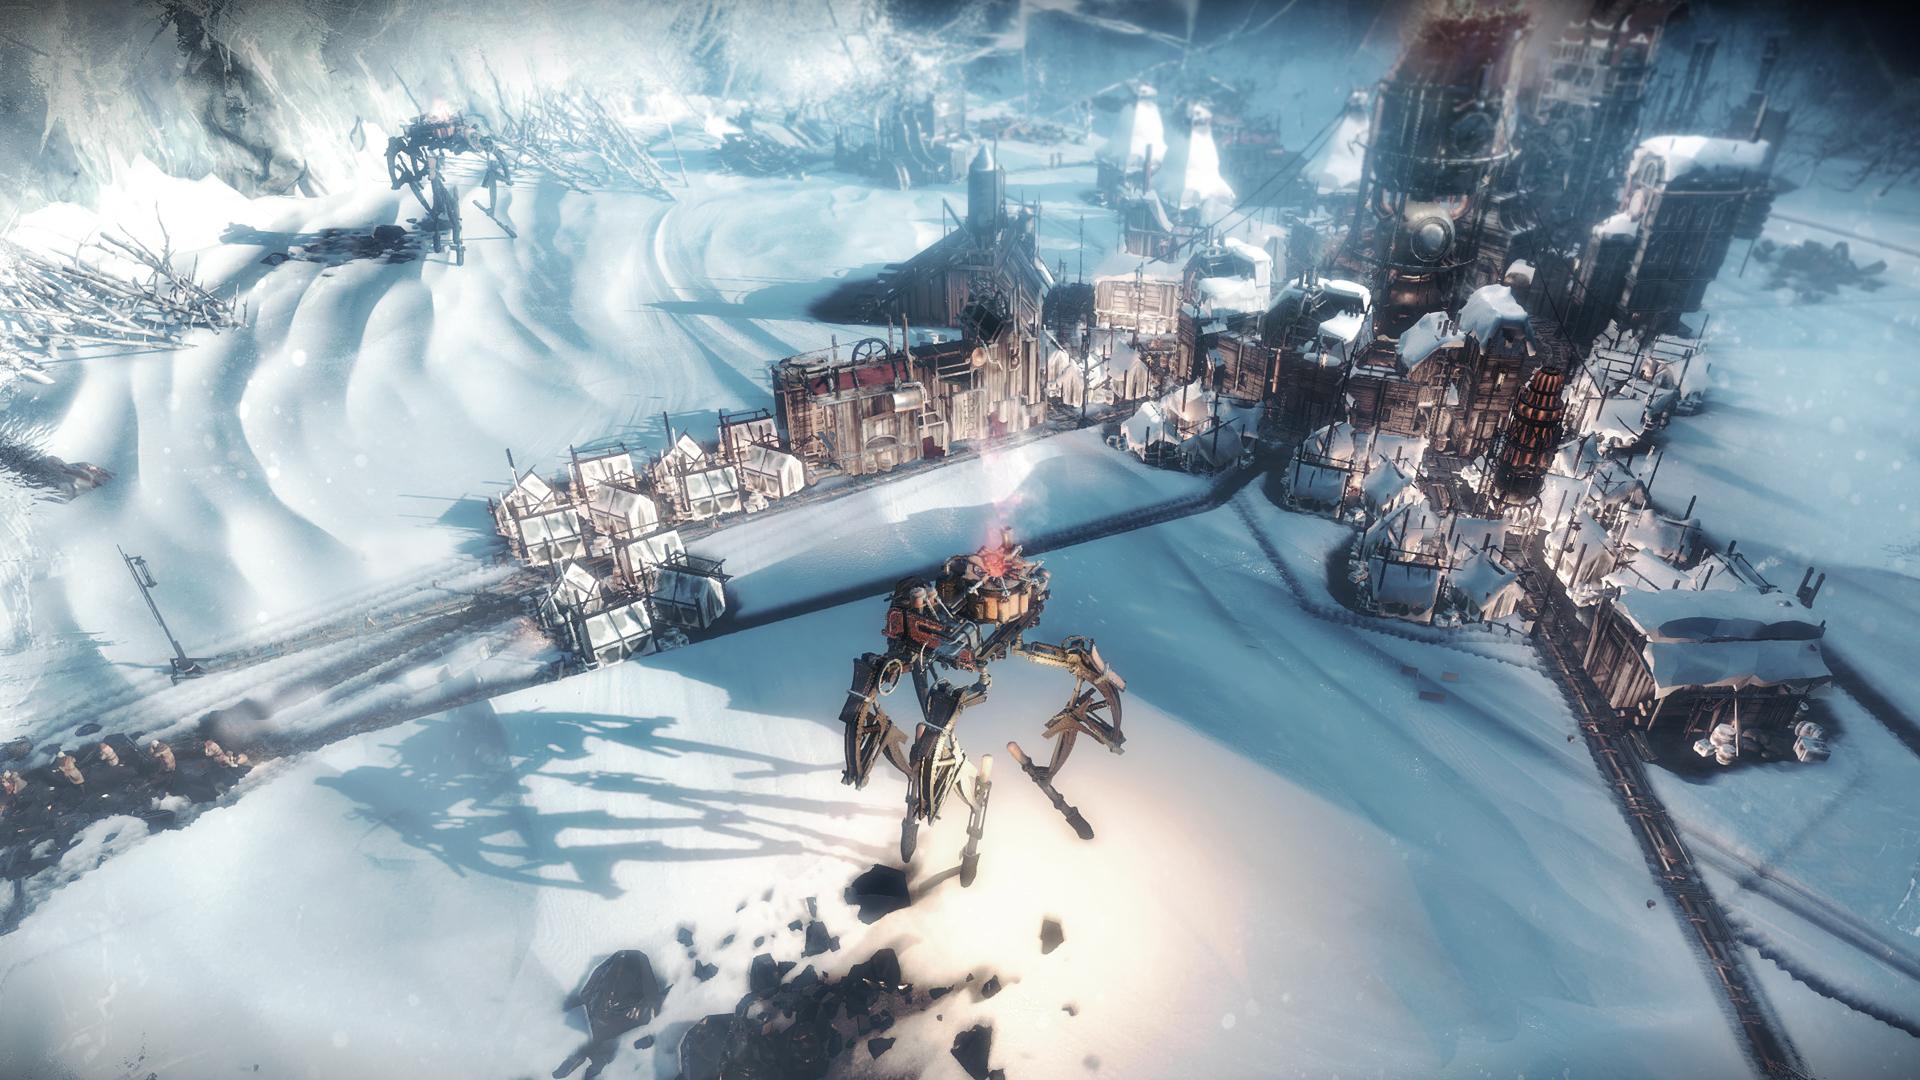 Frostpunk 2018 Game Wallpapers: Frostpunk On Steam